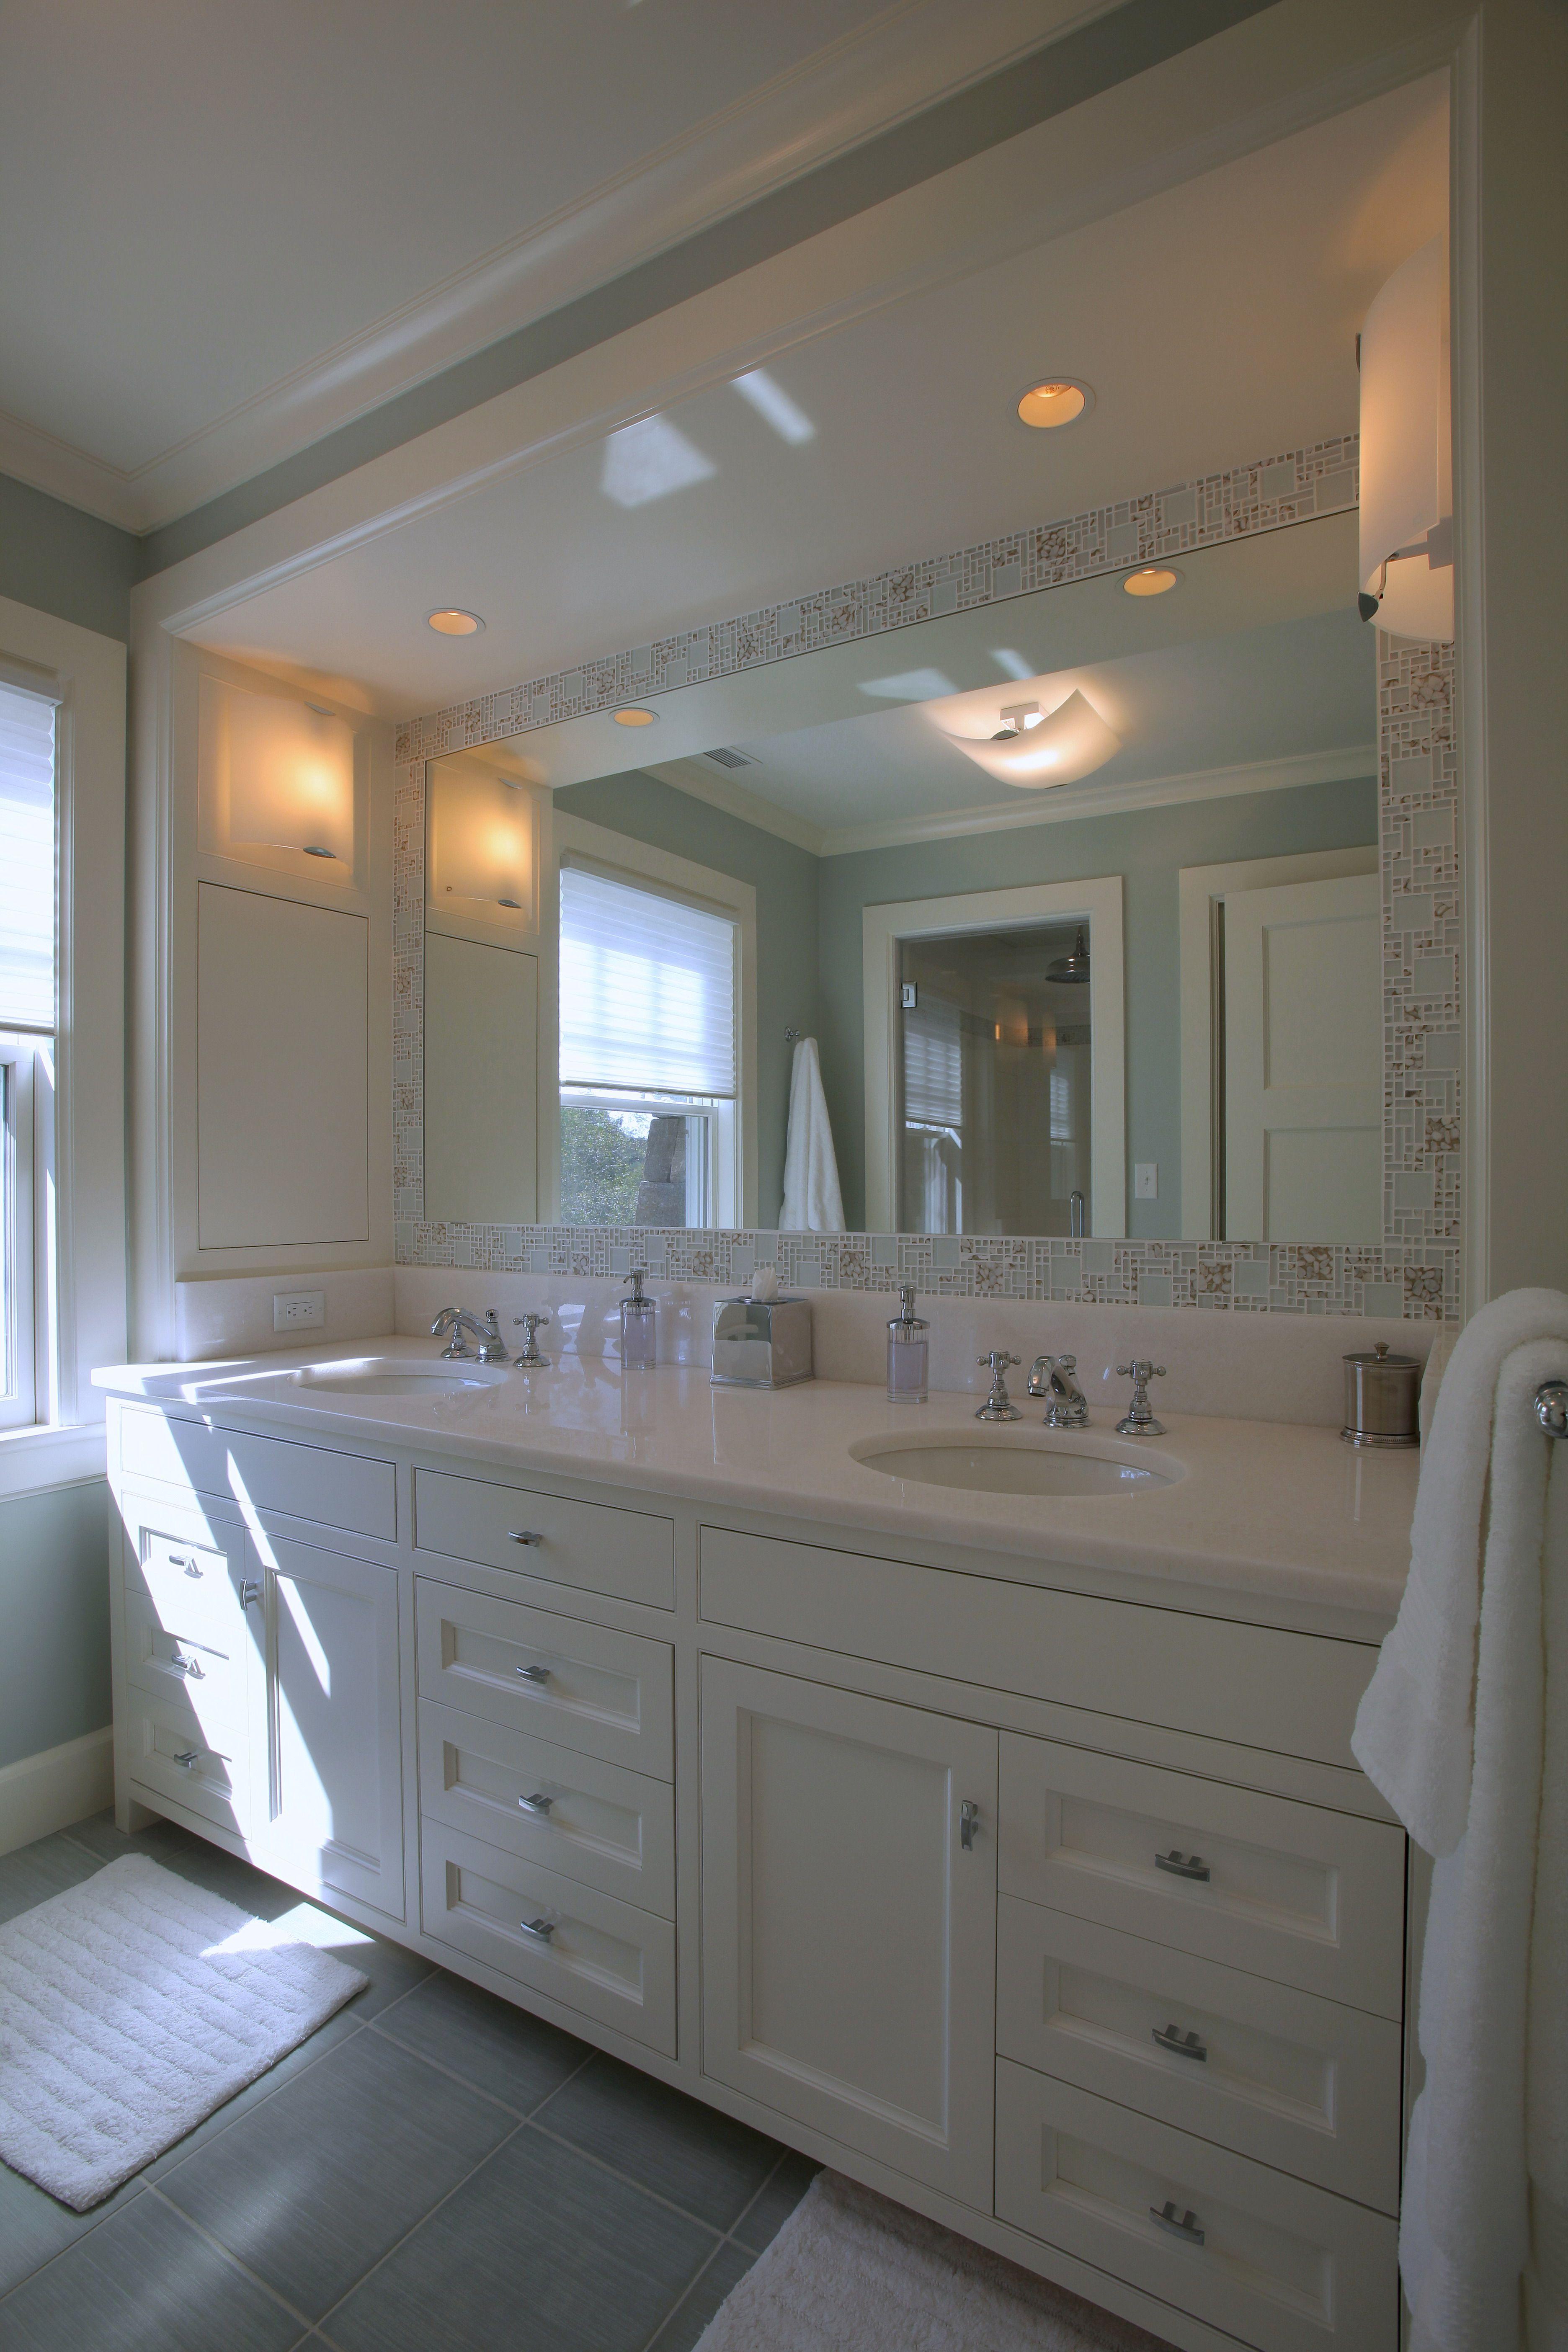 Jack And Jill Bathroom Jack And Jill Bathroom Bathrooms Remodel Bathroom Design